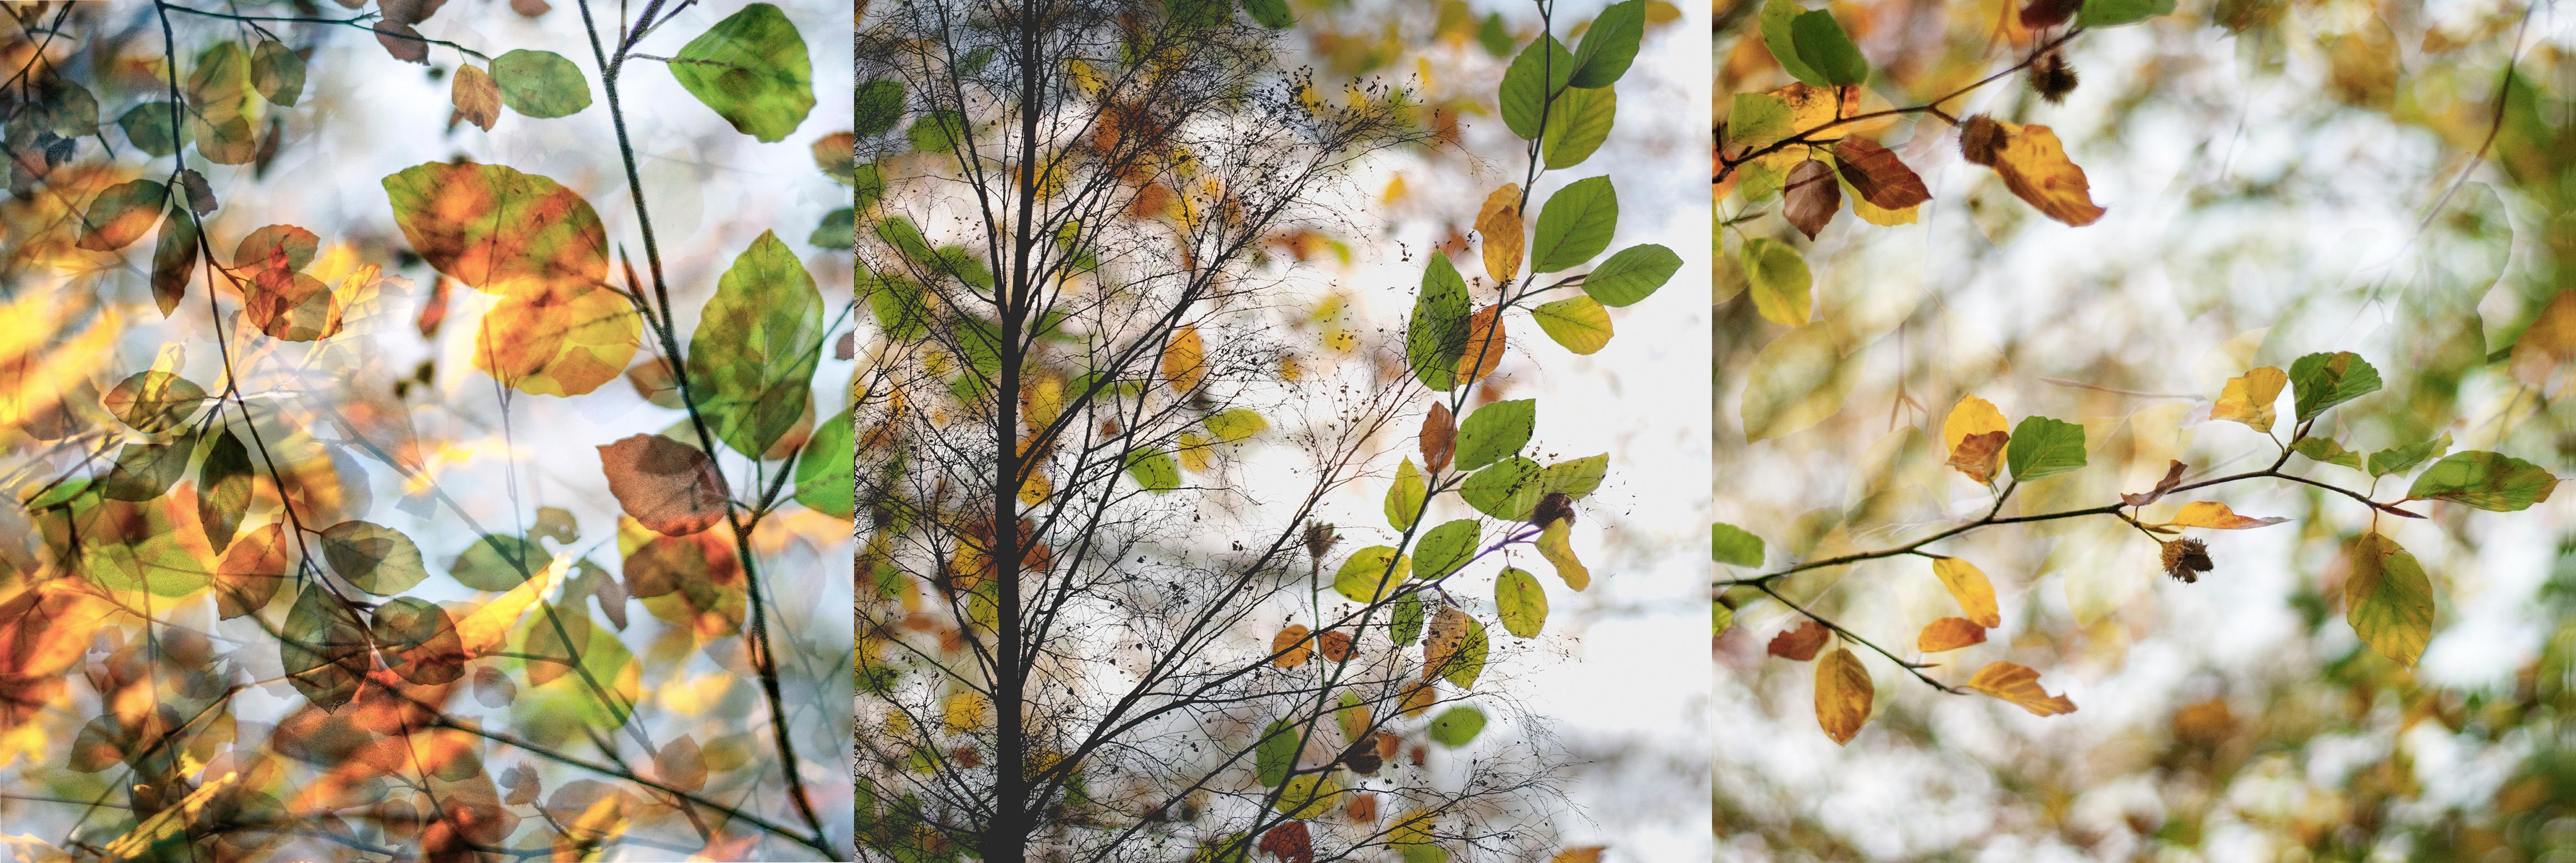 autumn_3edit